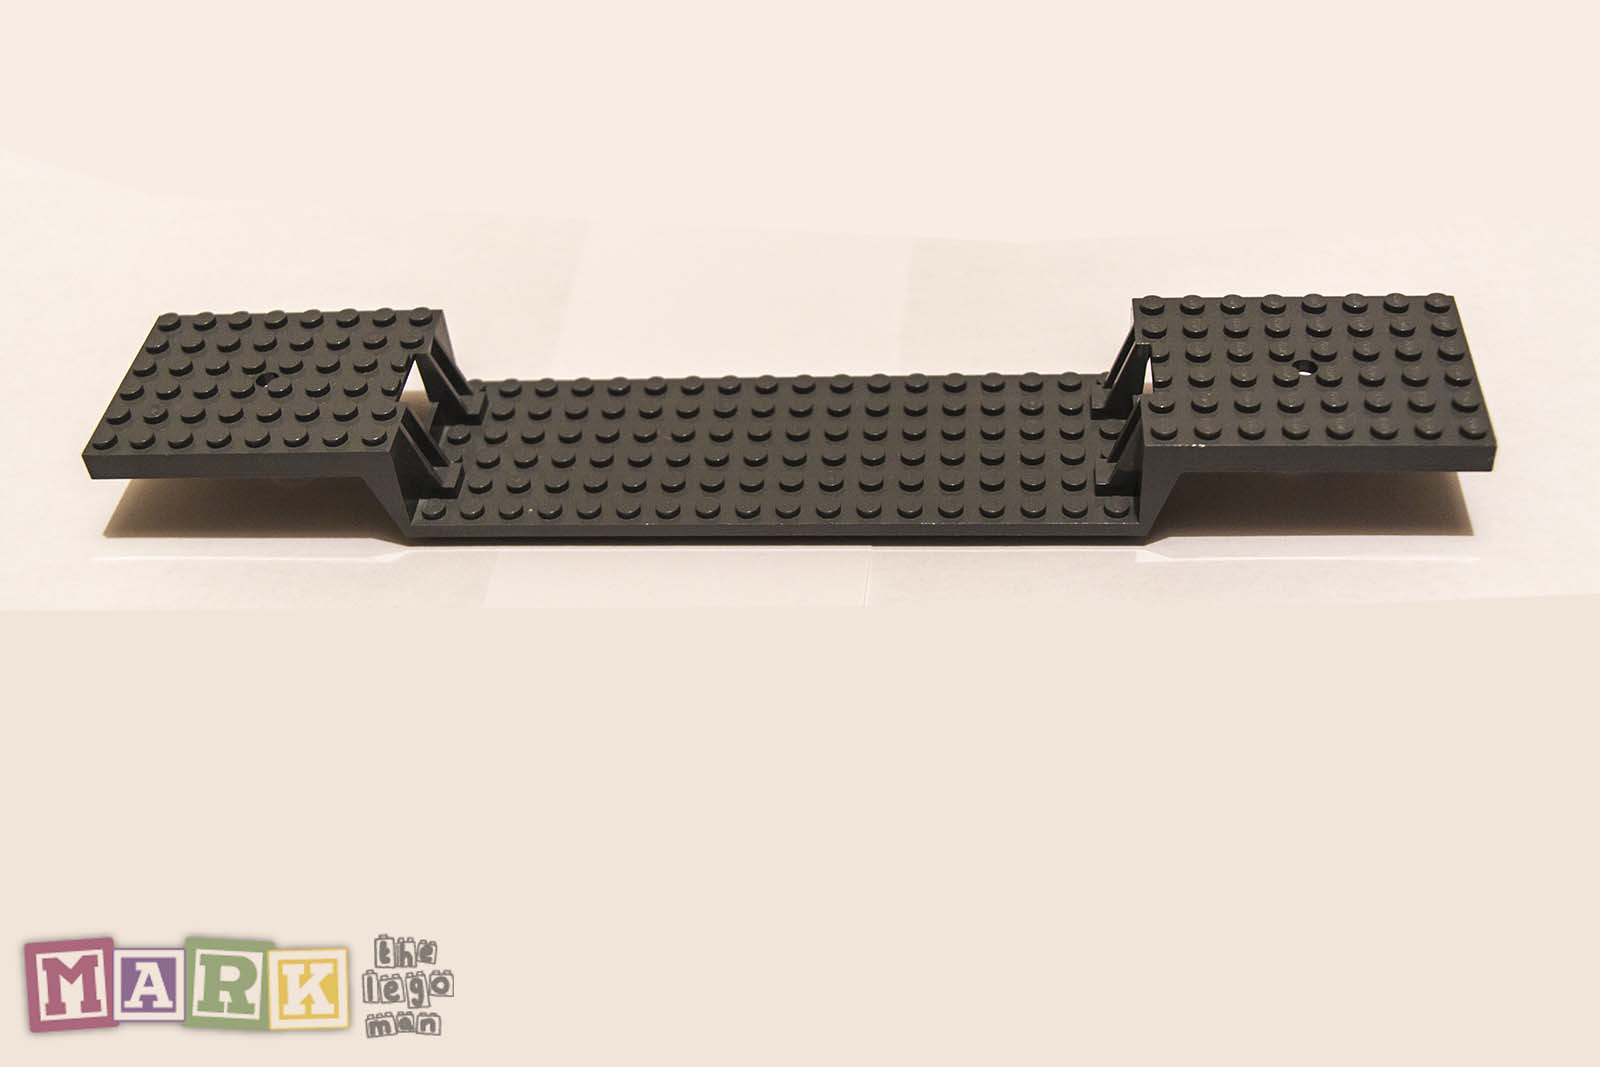 Very Rare Special Lego Train Base 2972 6x34 Split Level Lego